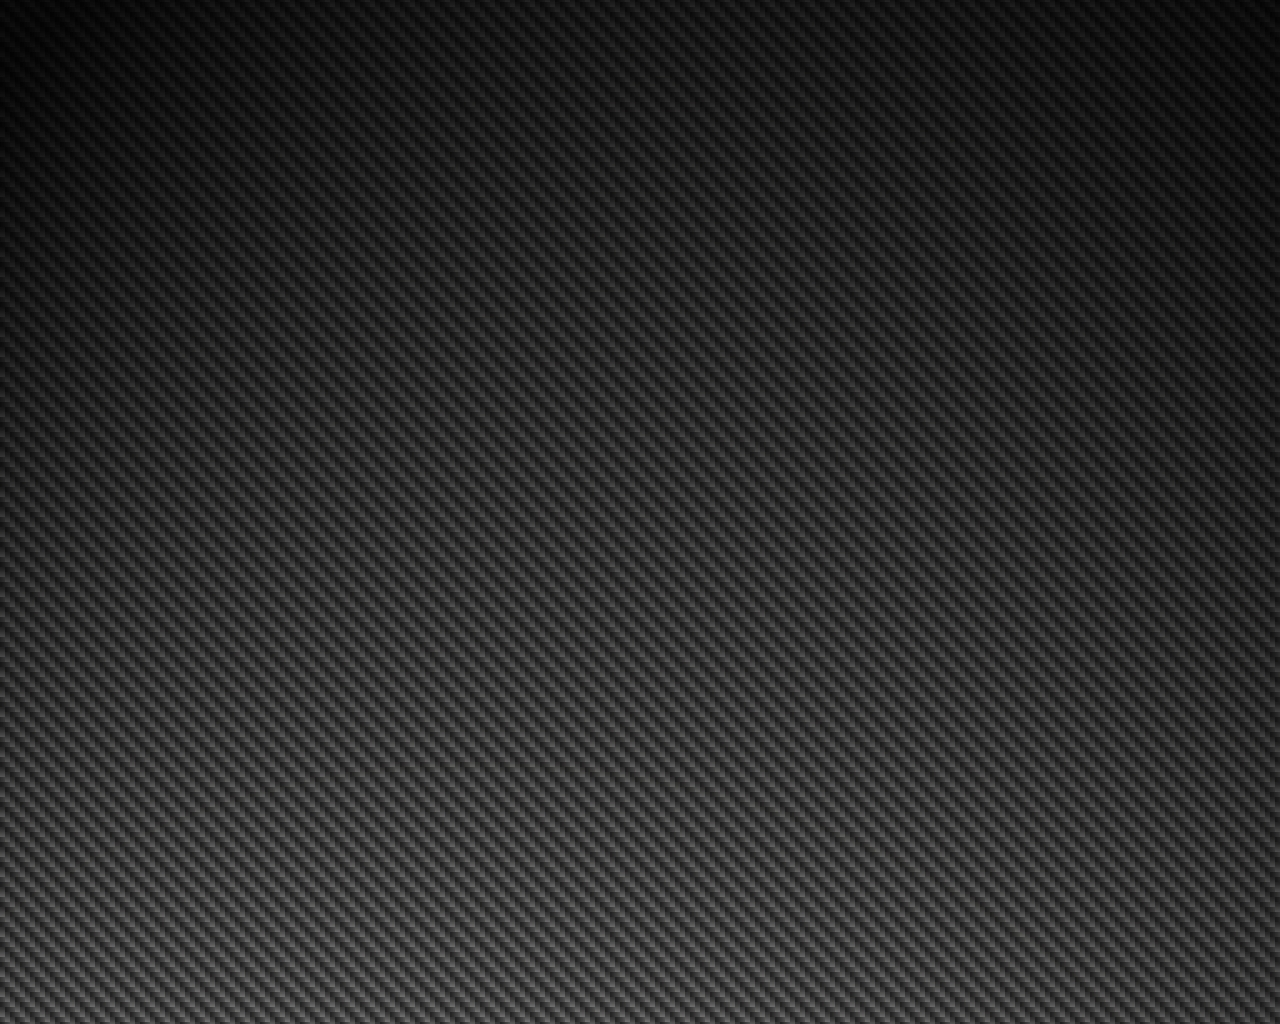 free! carbon fiber wallpaper | ebin